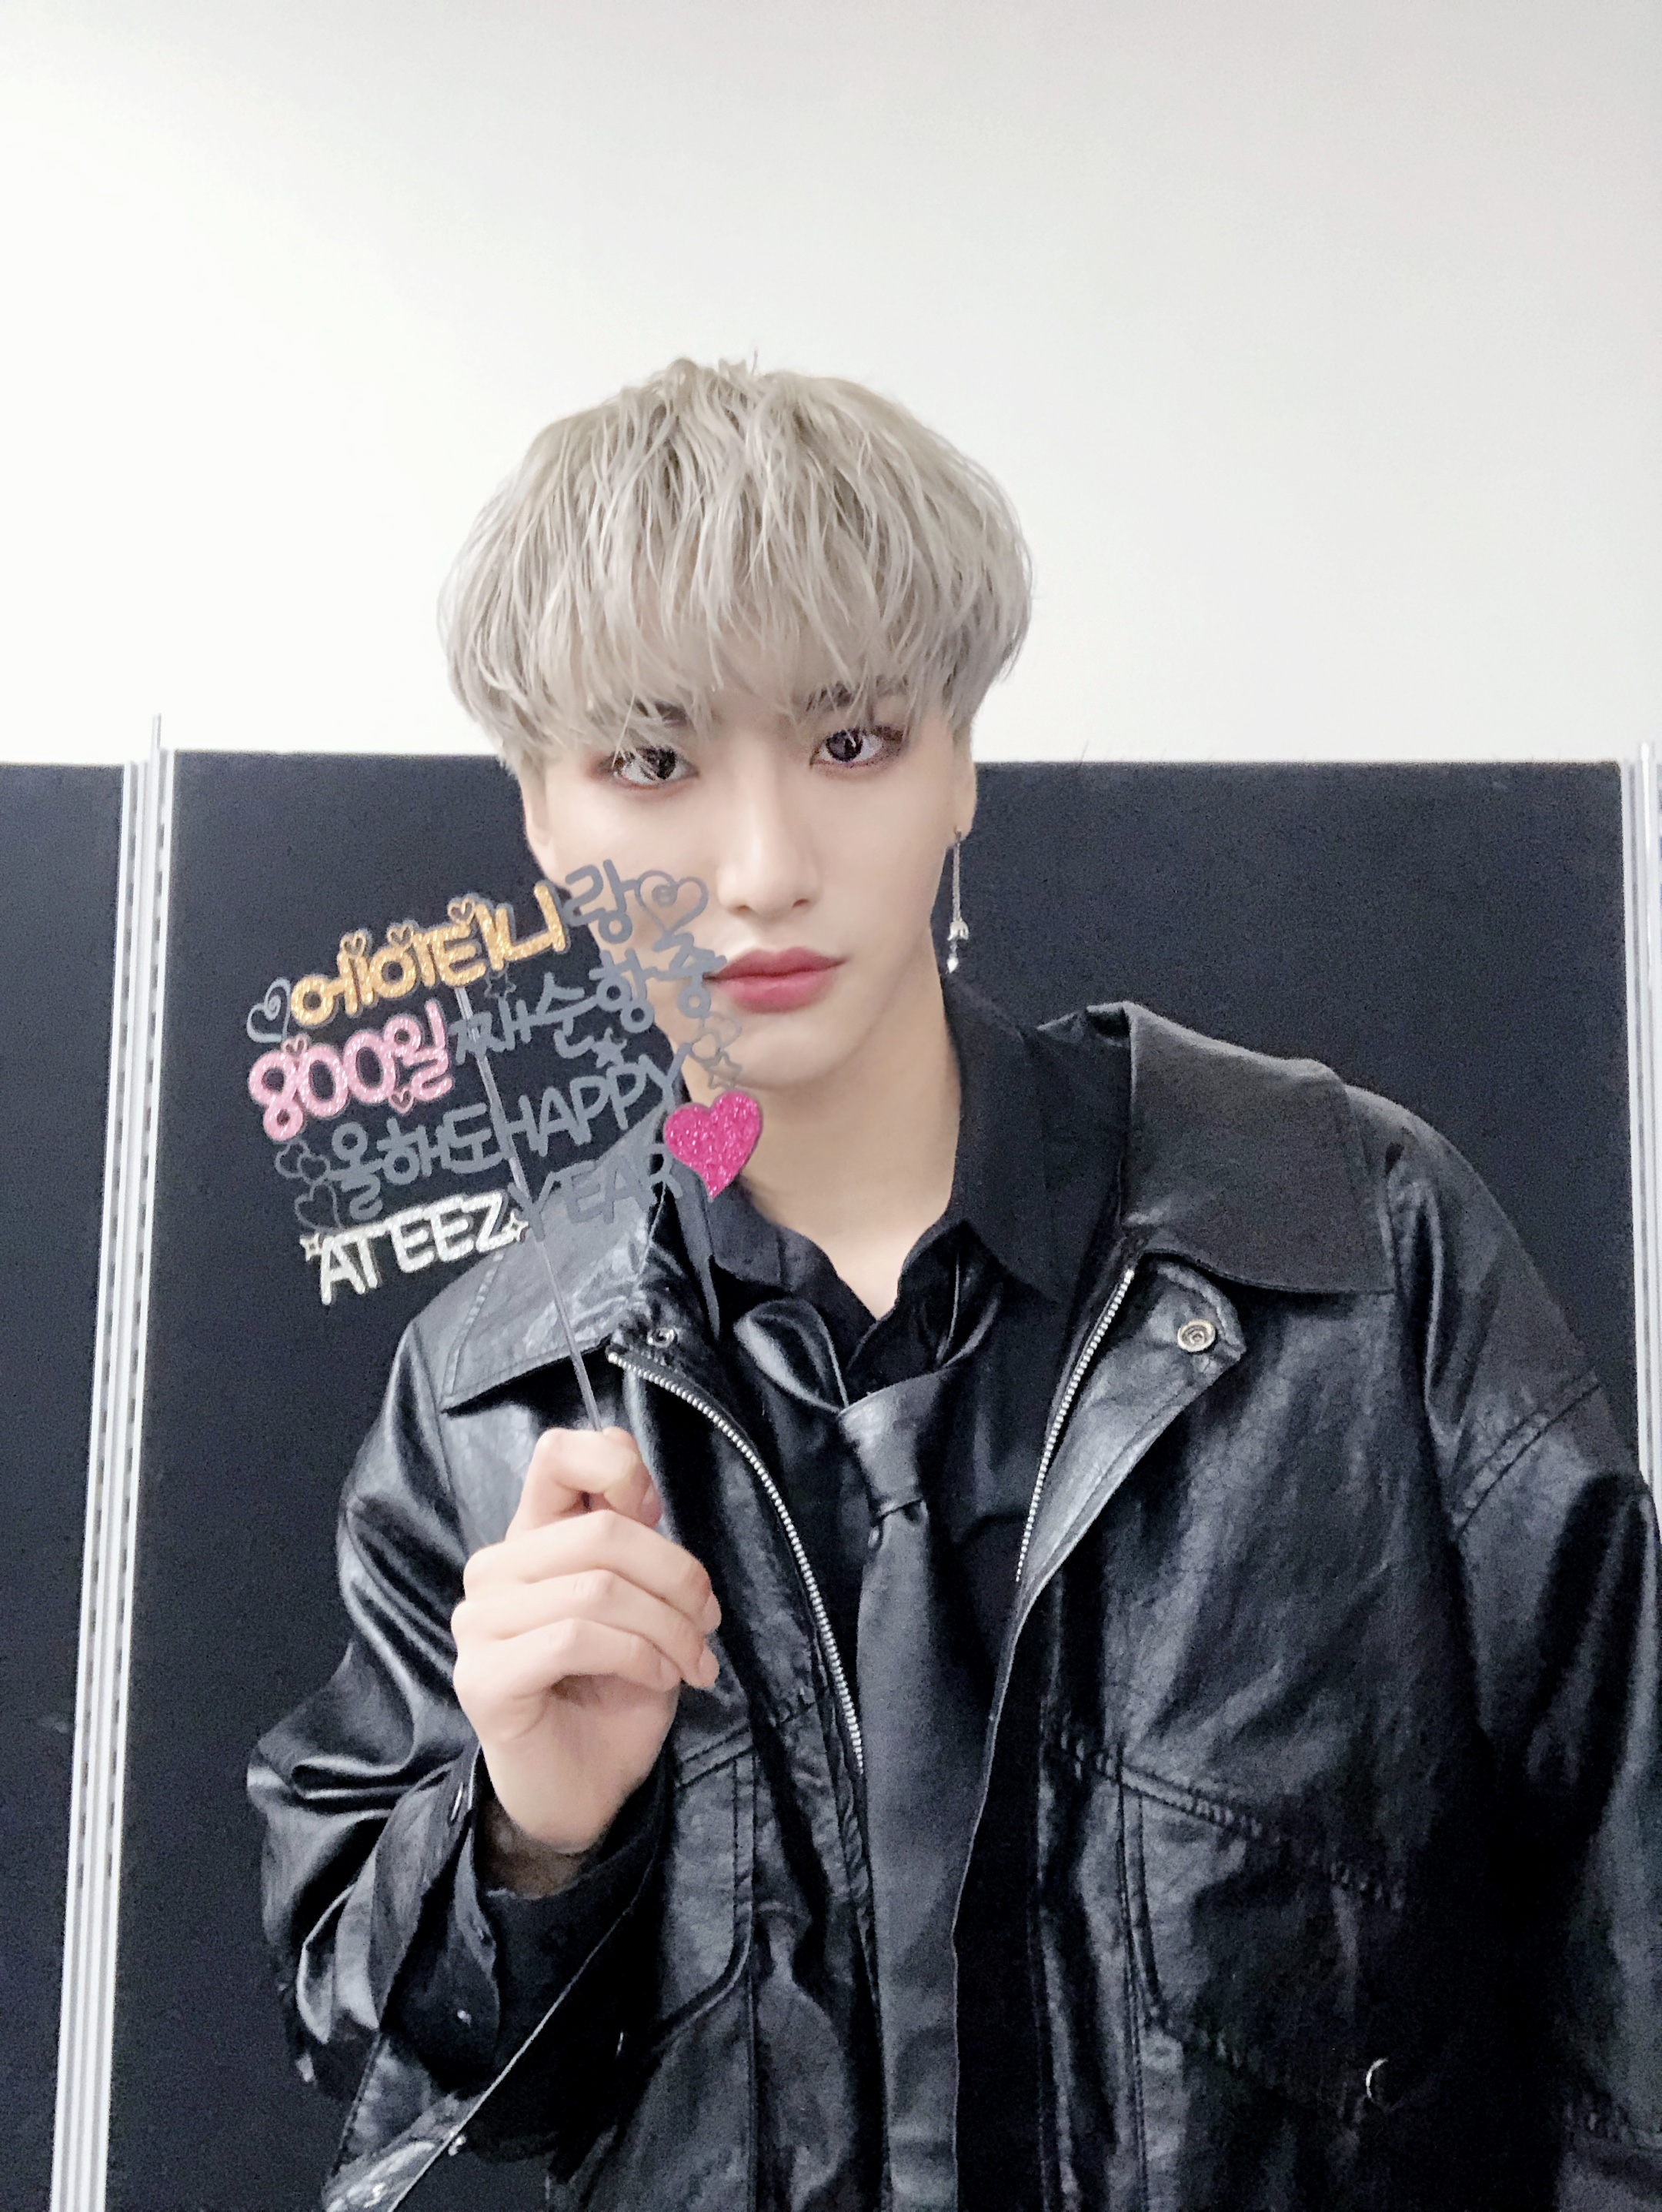 Seonghwa (ATEEZ) Profil mit allen Fakten 2020